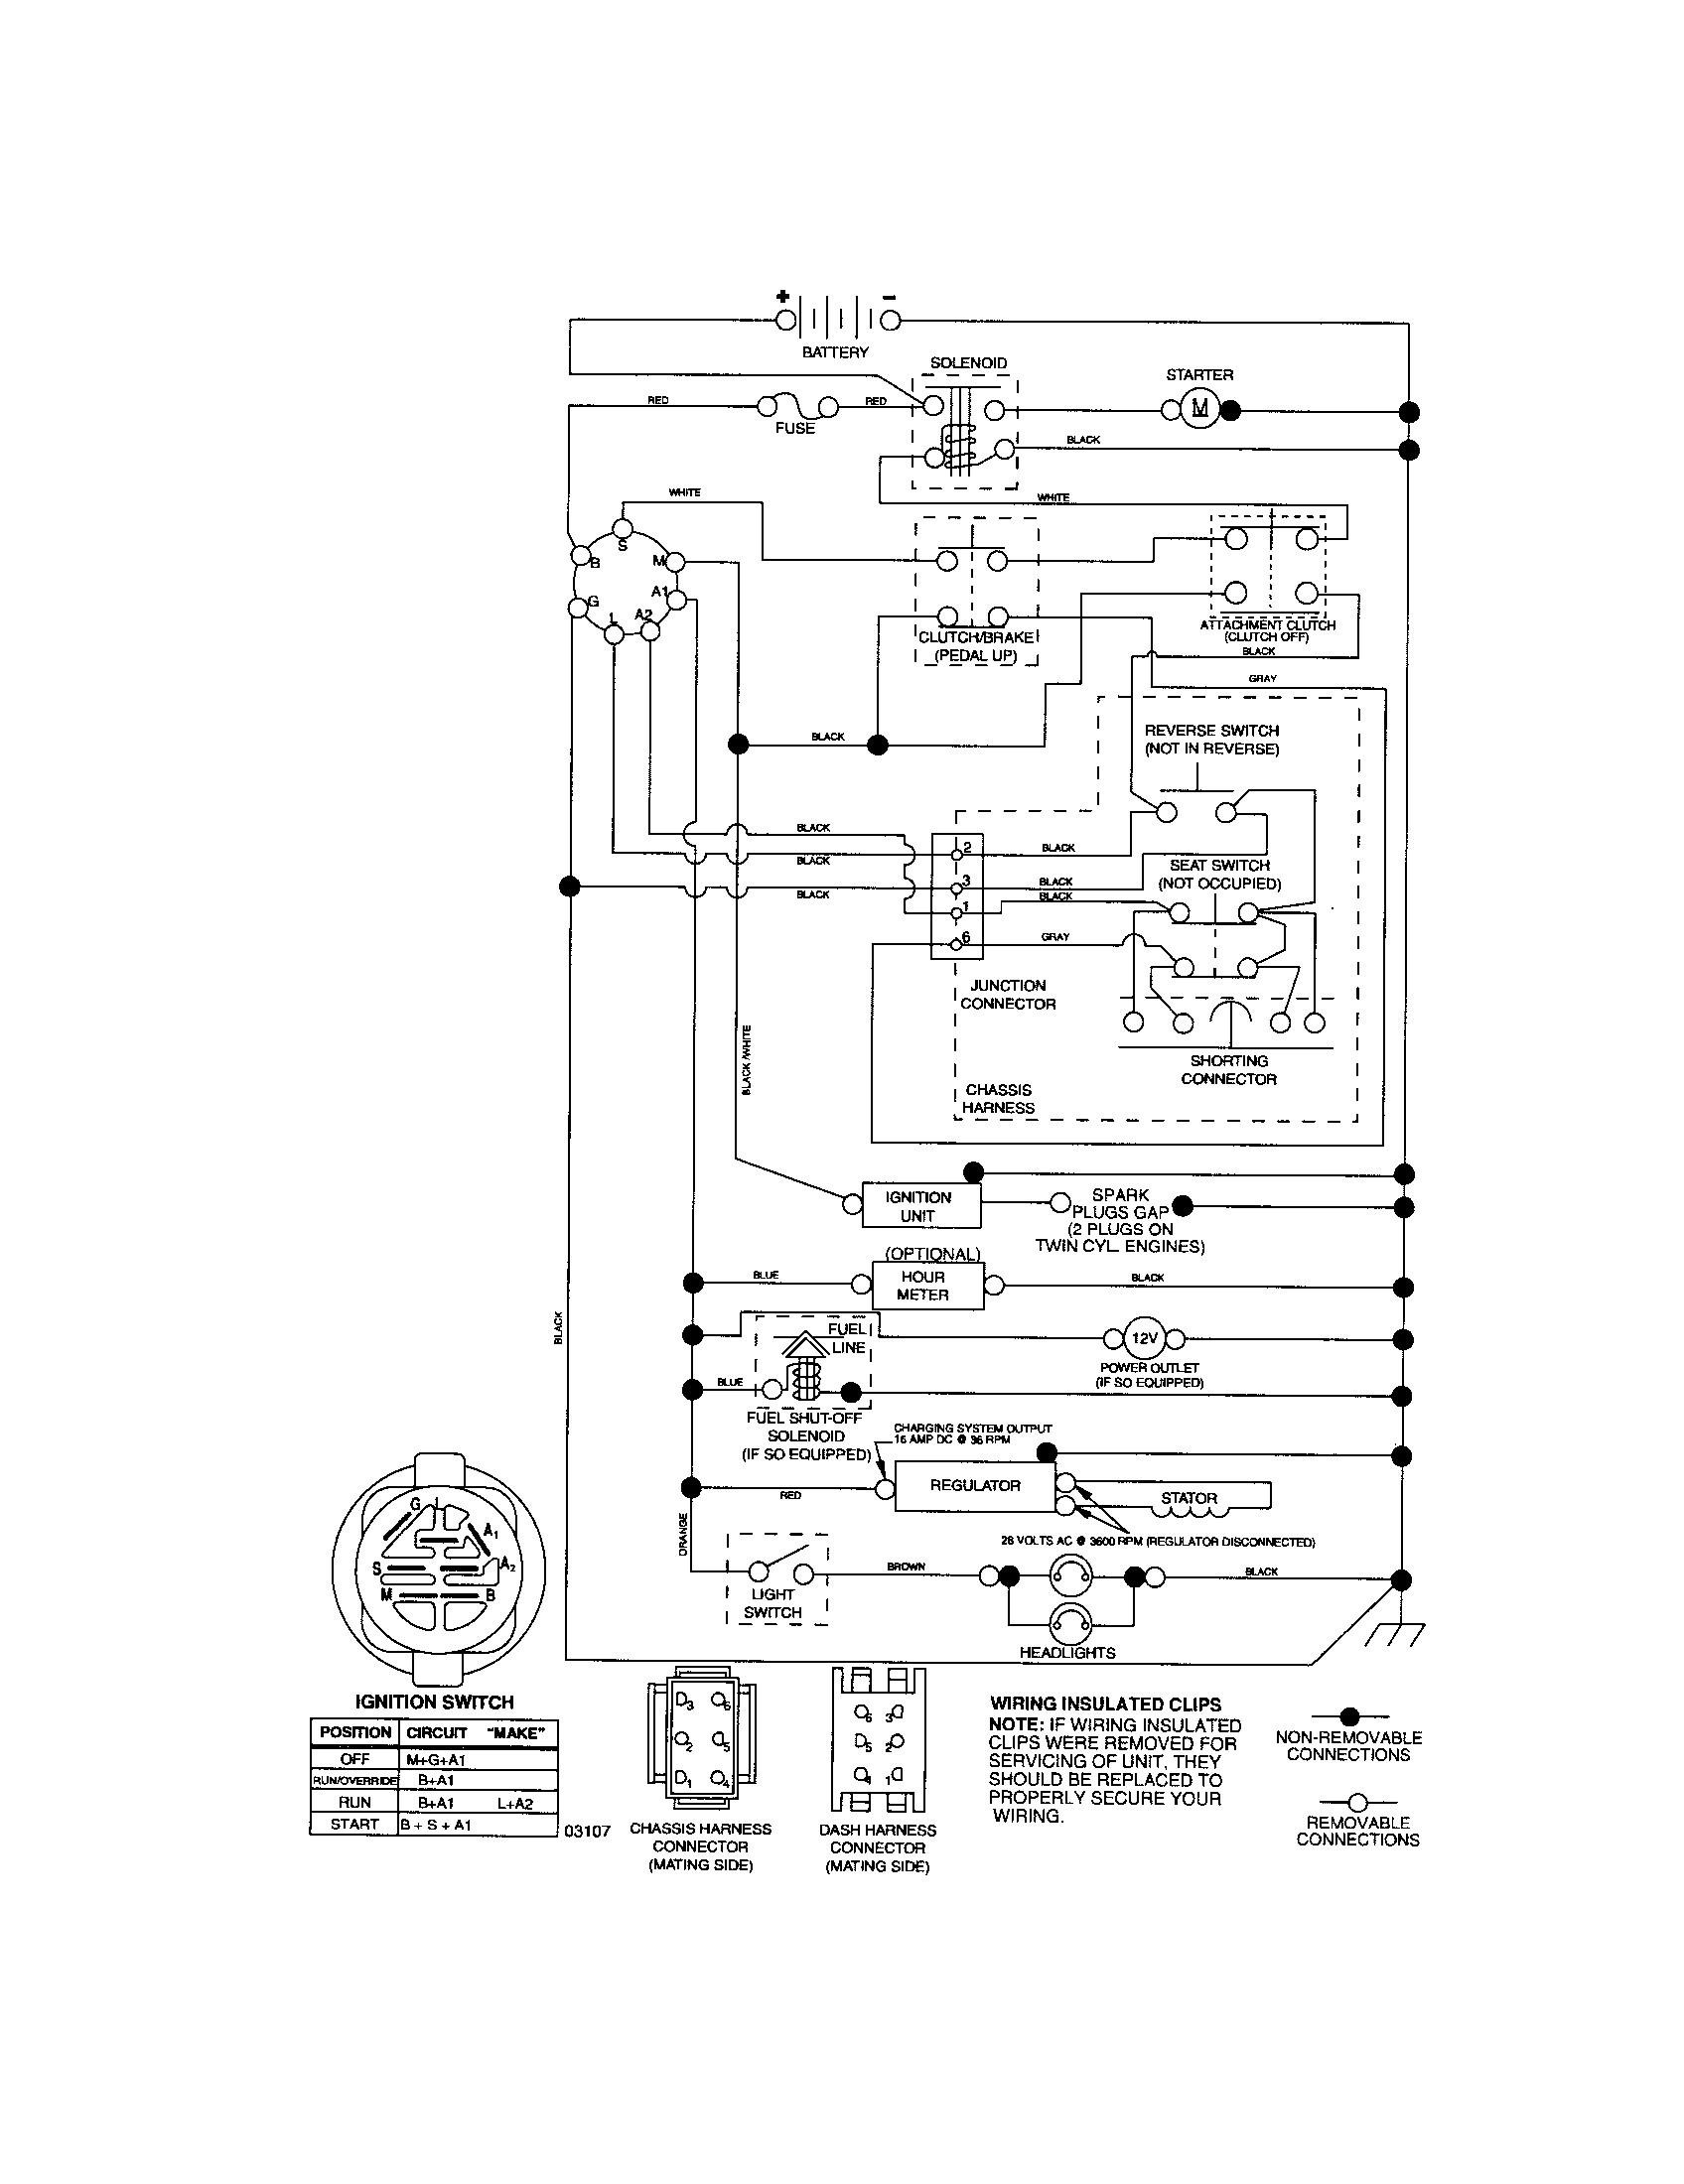 Old Wheelhorse Tractor Wiring Diagram on